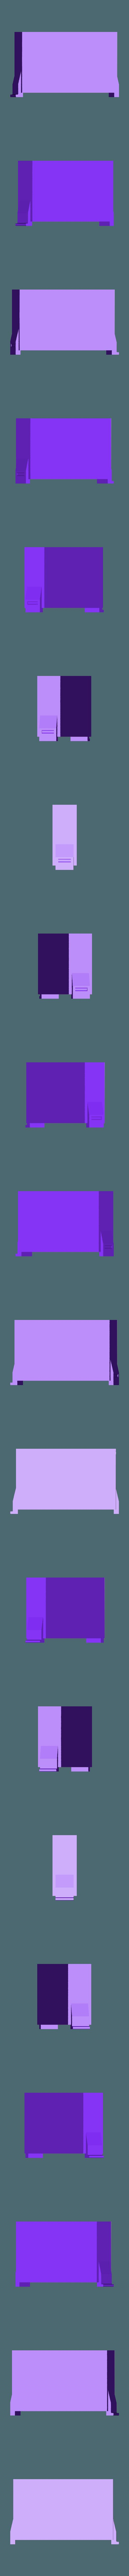 Nerfpistol_clip_v1.2.STL Download STL file Nerf pistol with clip • 3D printer design, MrCrankyface